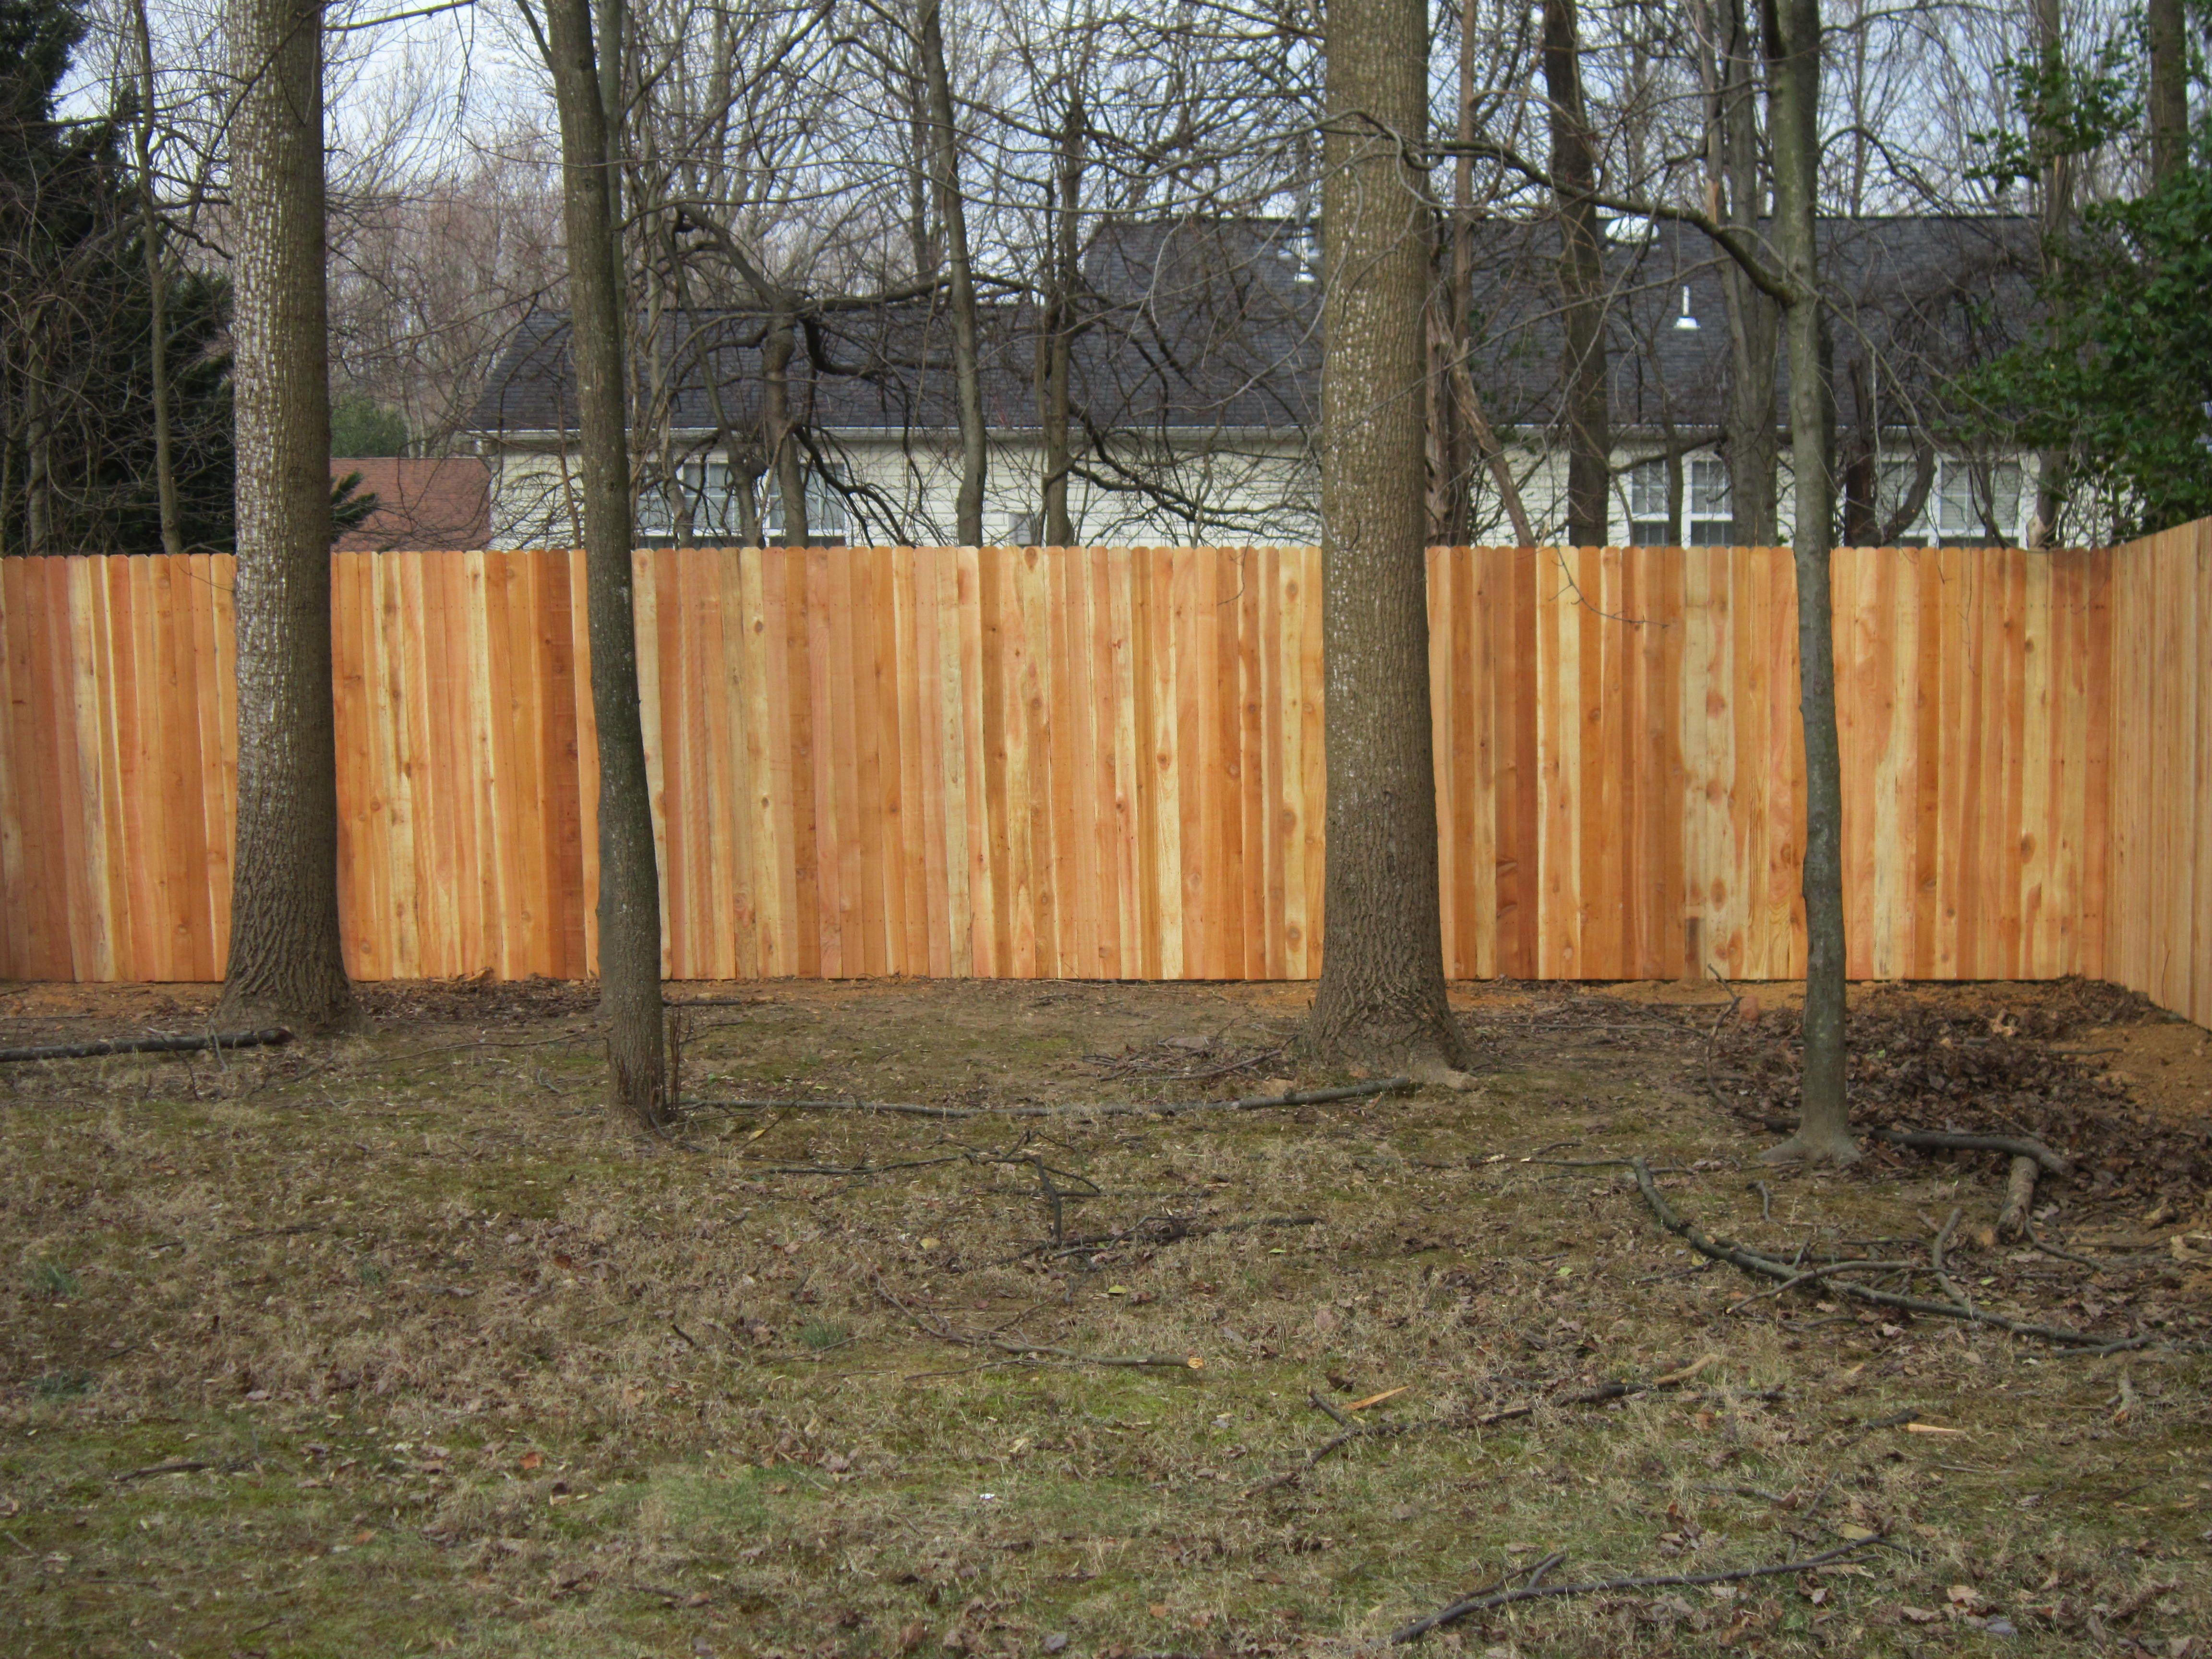 Western Red Cedar Privacy Fence - Solid Board with a Dog Ear